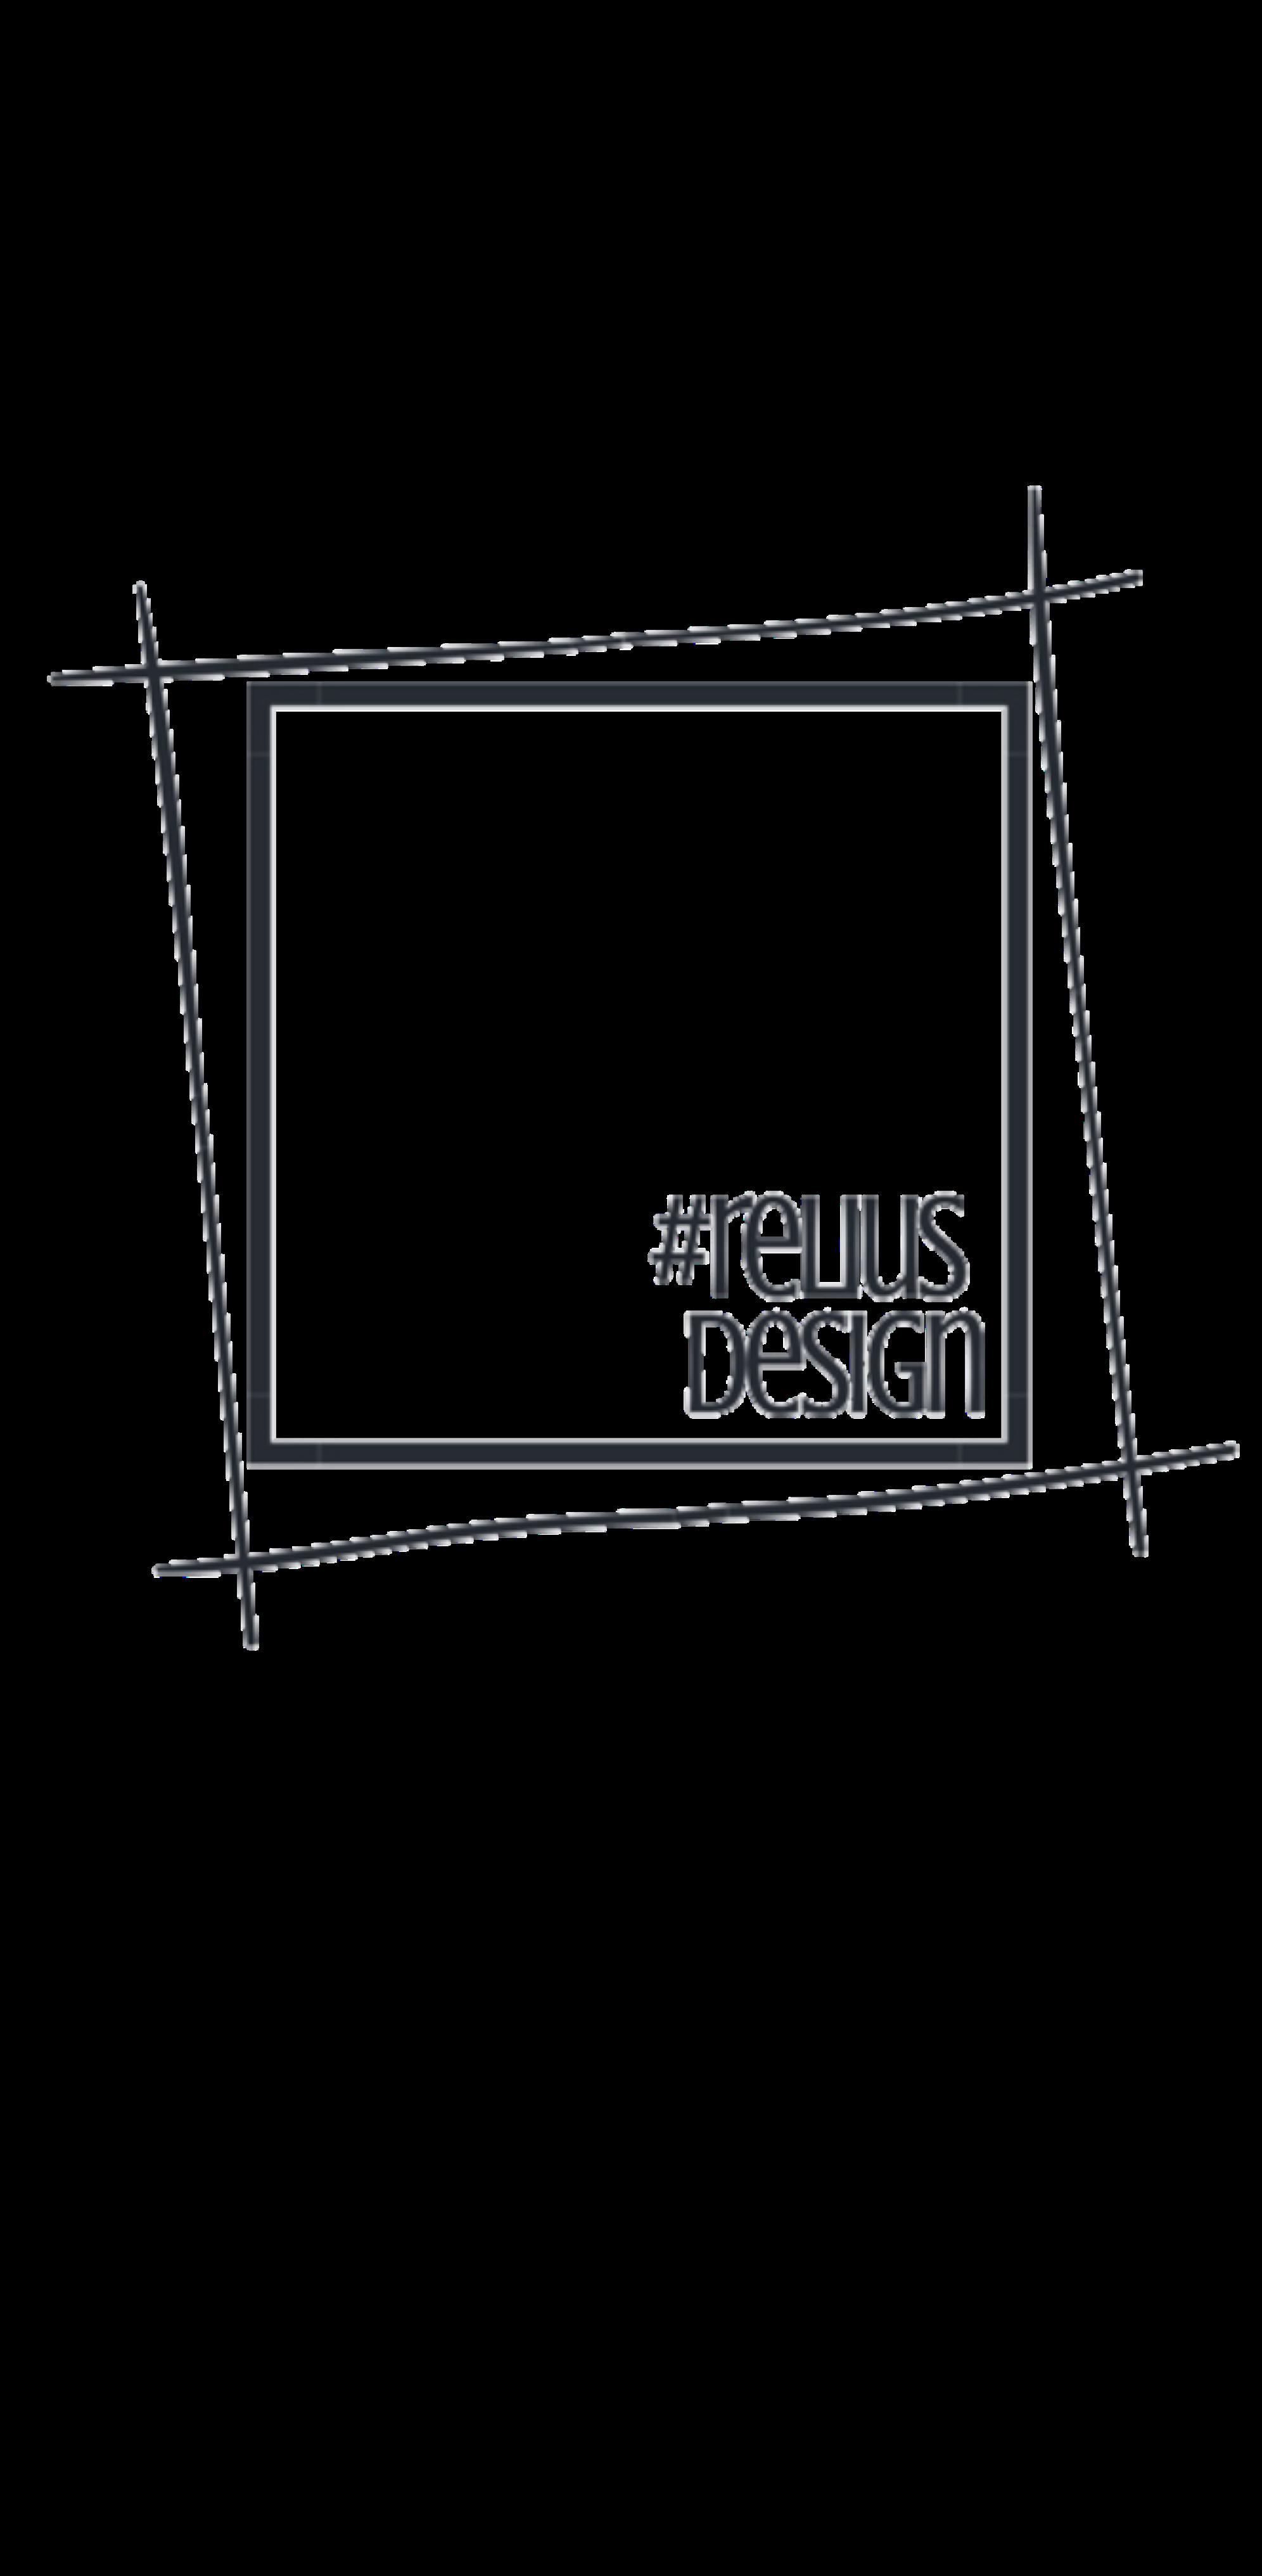 cover #reliusdesign